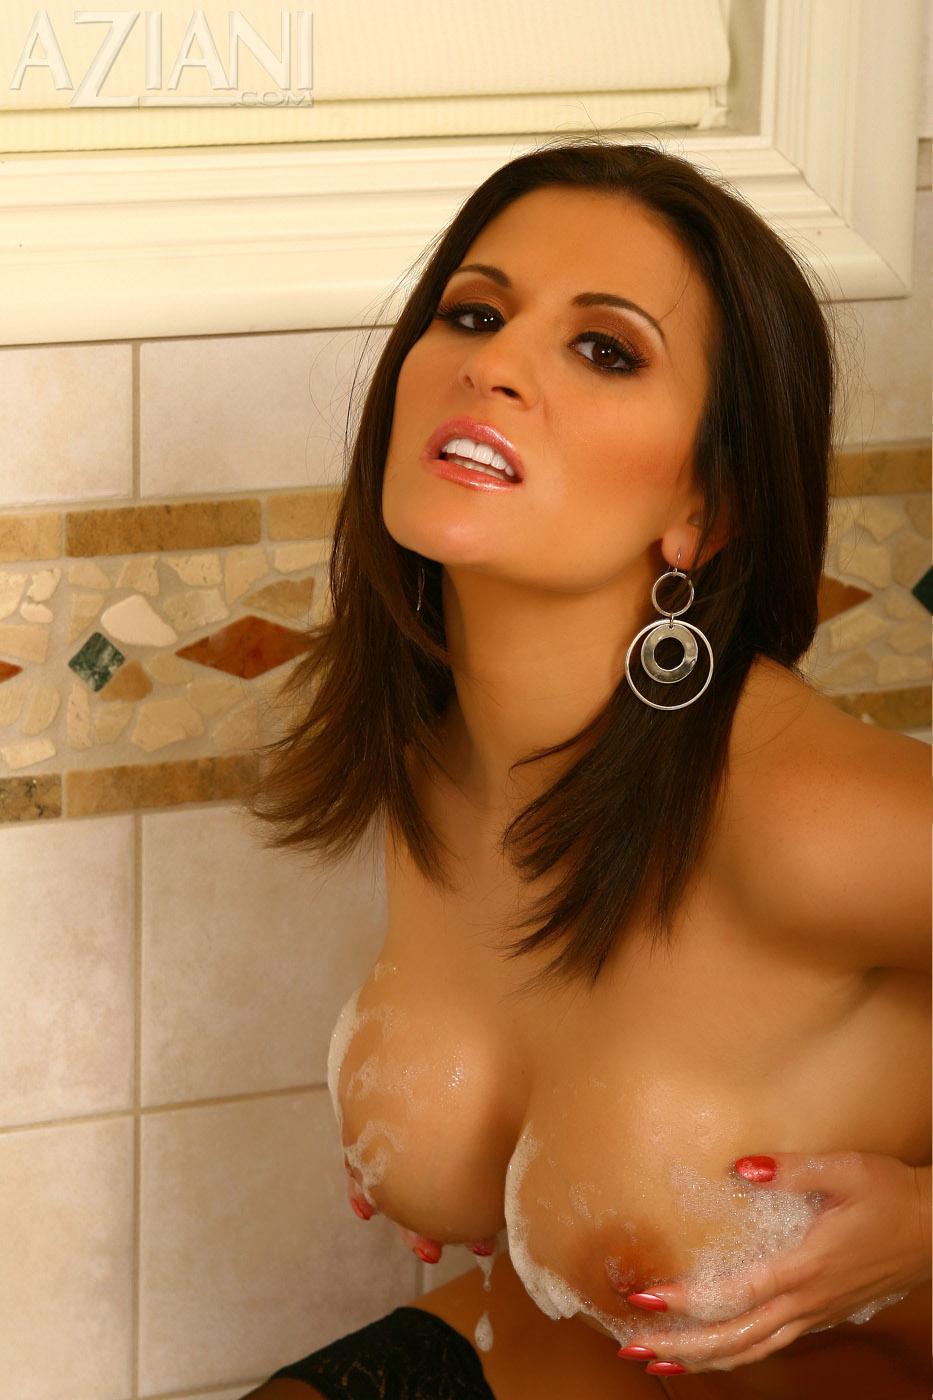 Porn big tits and ass